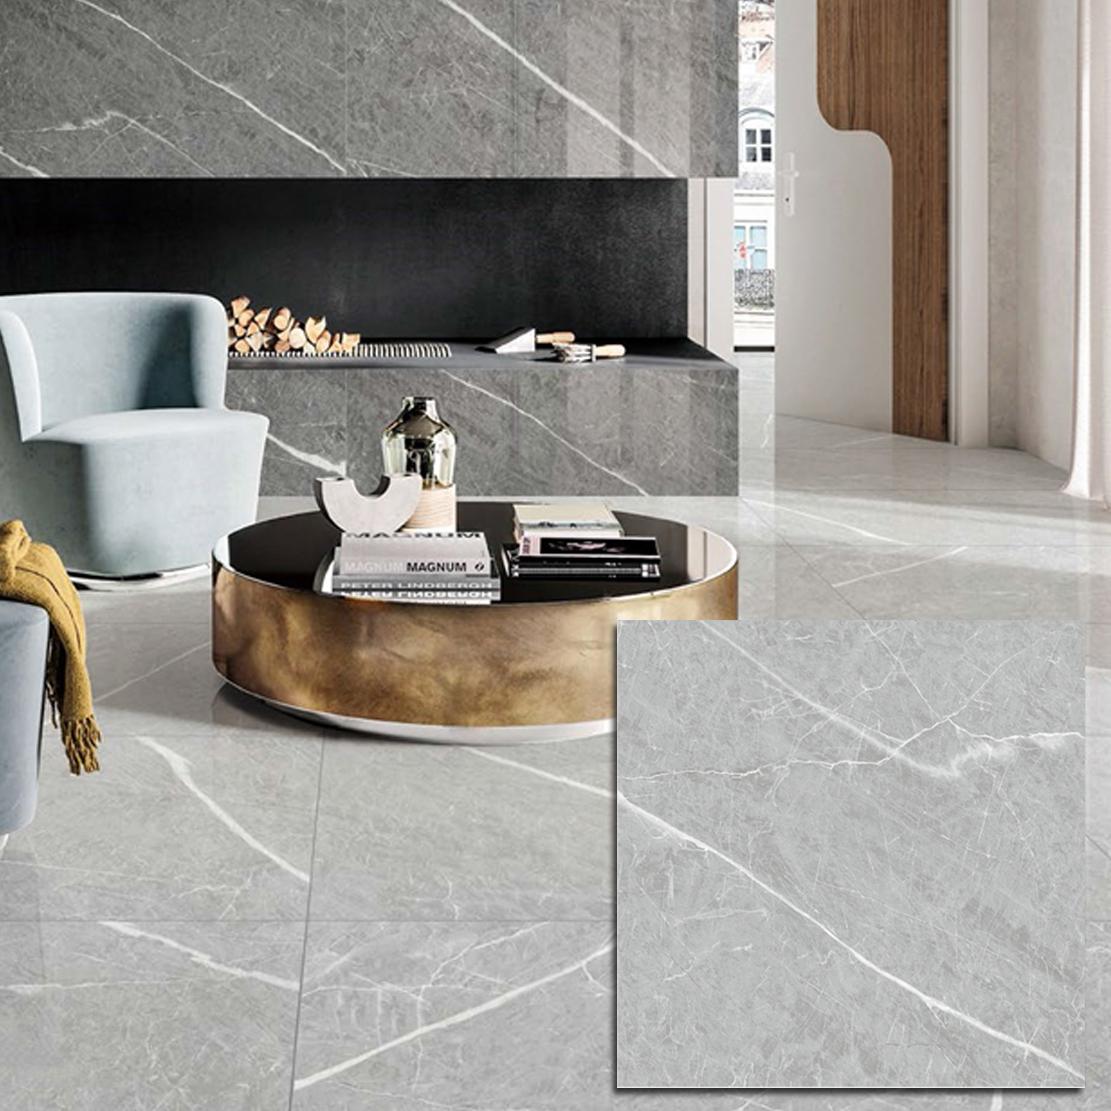 Non Slip Kitchen Bathroom 9x9 Through Body Porcelain Floor Tiles  Ceramic Manufacturers   Buy Floor Tile Ceramic,Ceramic Floor Tiles,Tiles  Ceramic ...